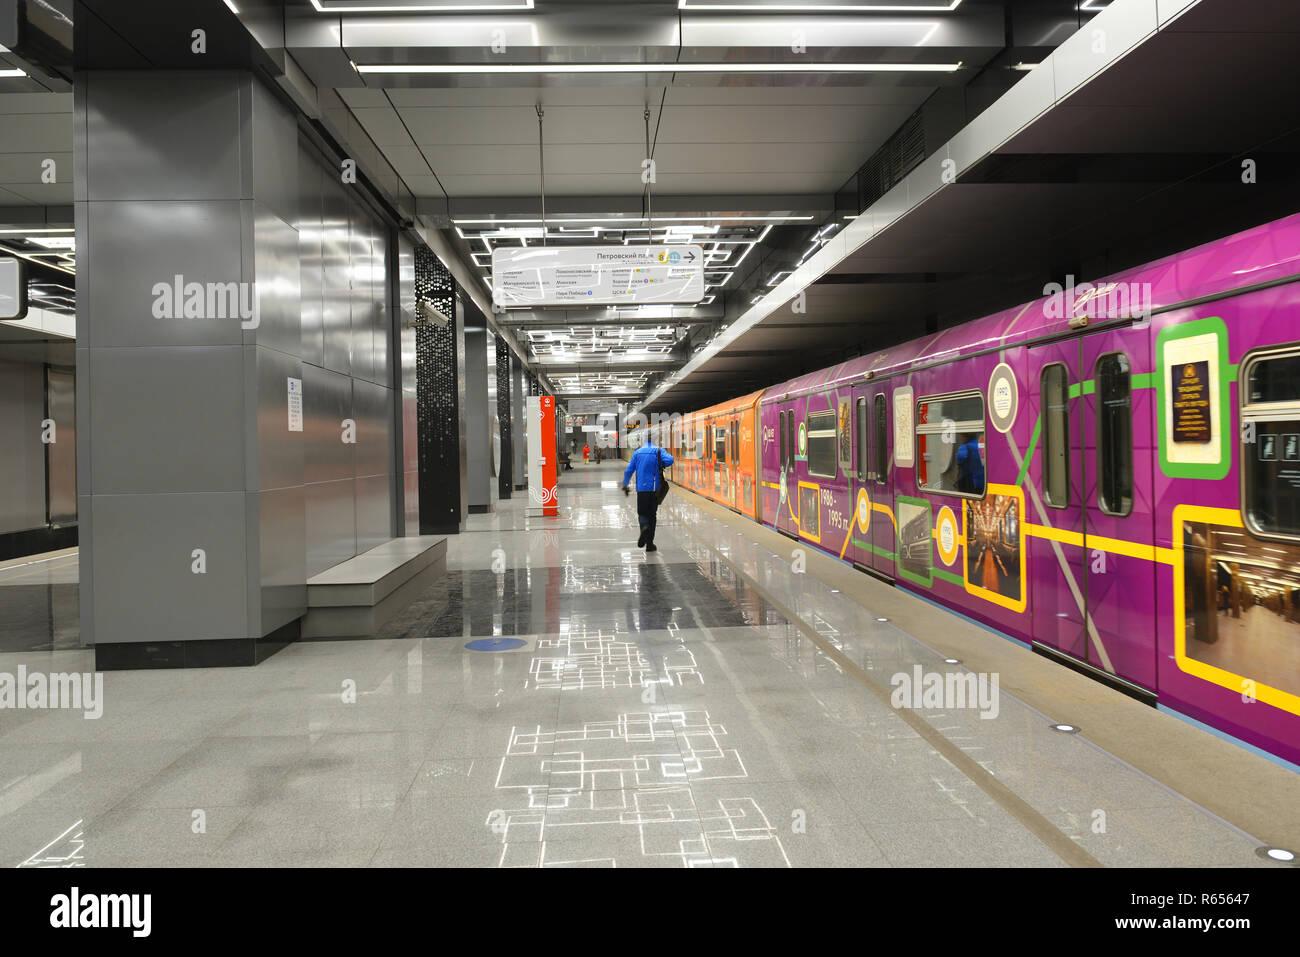 d8504c56e2b Govorovo, station on Kalininsko-Solntsevskaya line of Moscow Metro, it  opened on 30